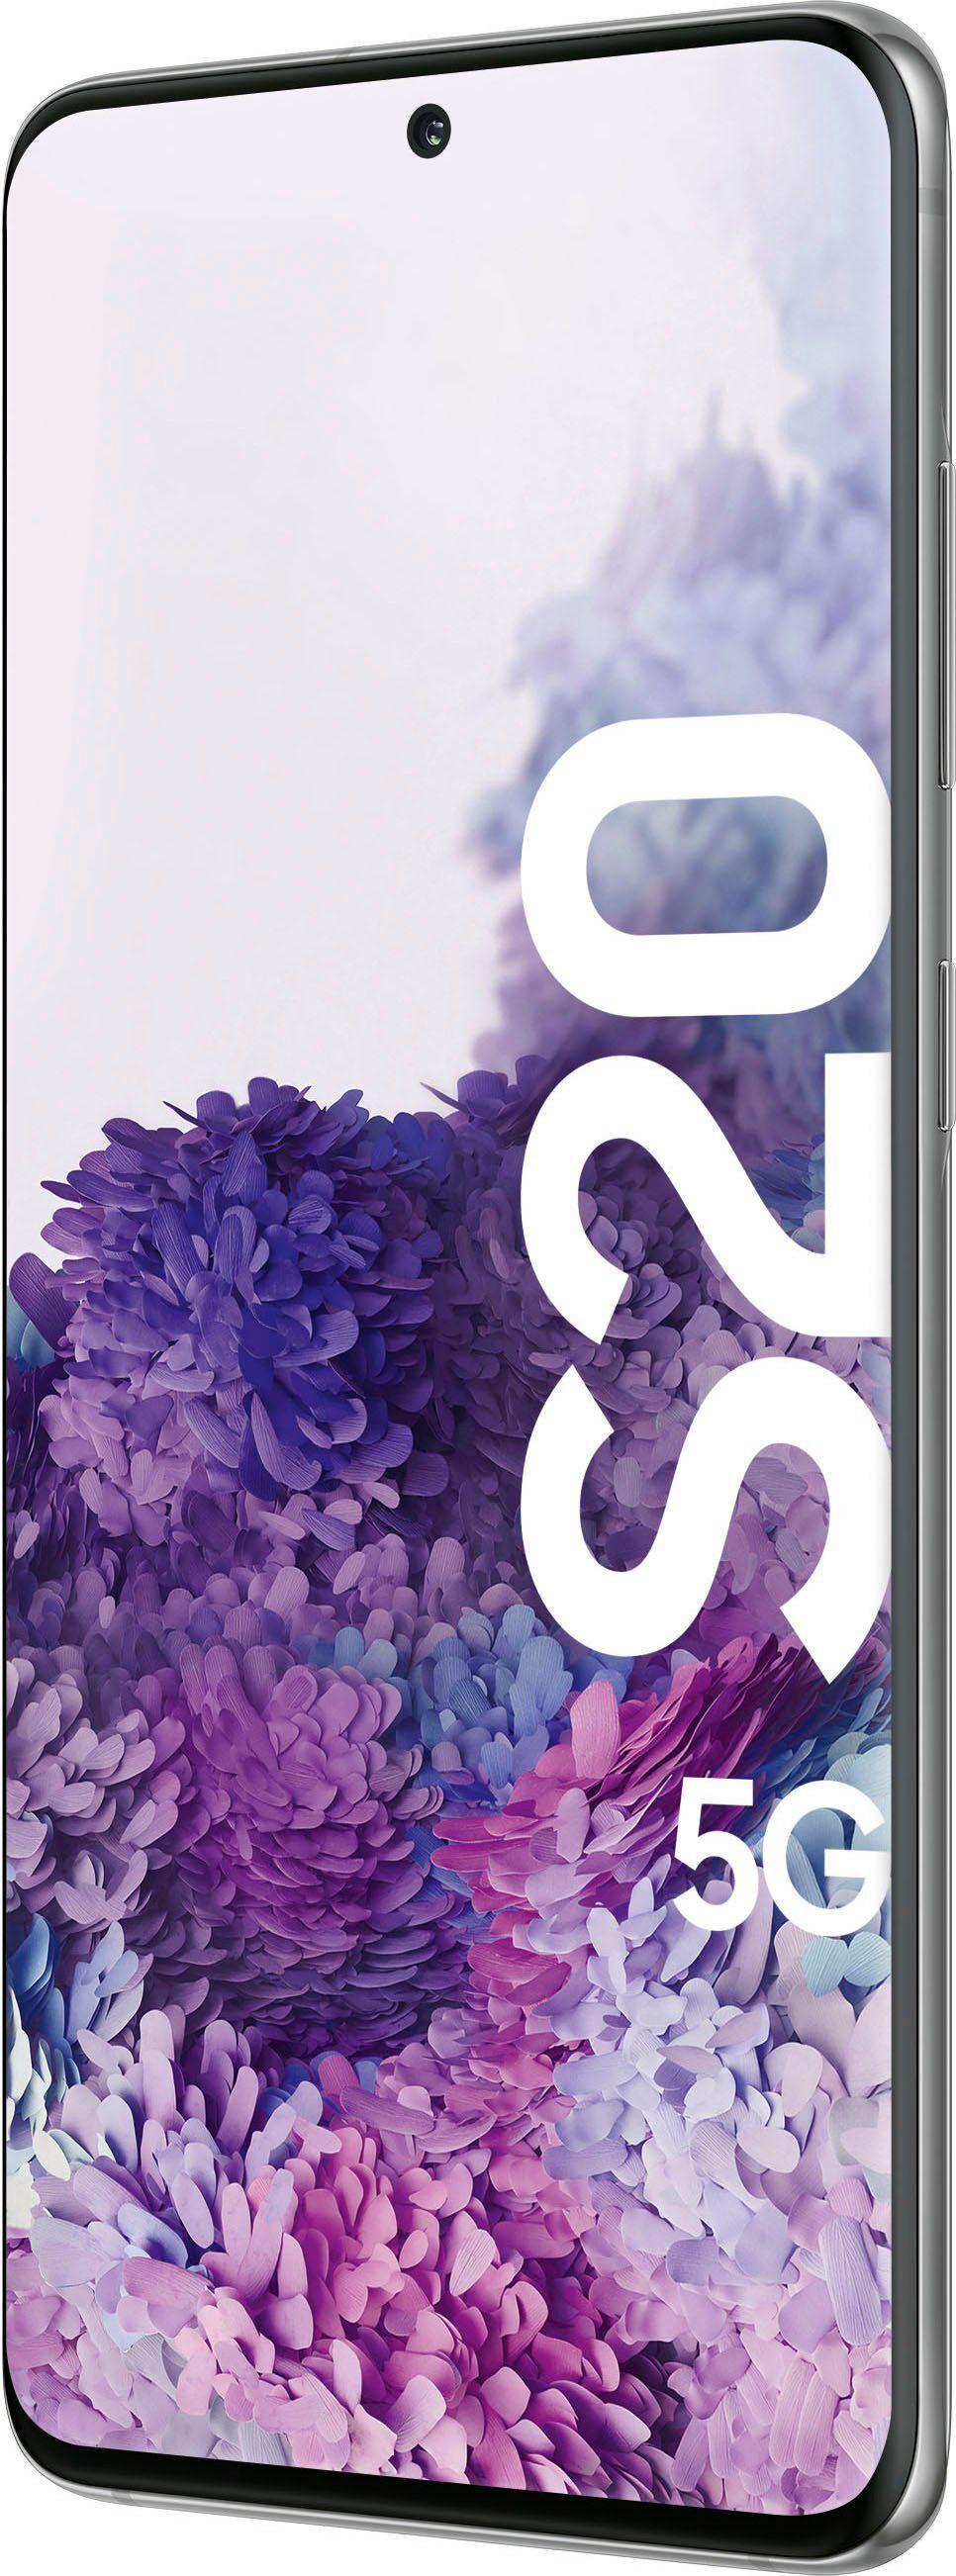 Samsung Galaxy S20 5G Smartphone (15,83 cm/6,2 Zoll, 128 GB Speicherplatz, 12 MP Kamera), Cosmic Gray